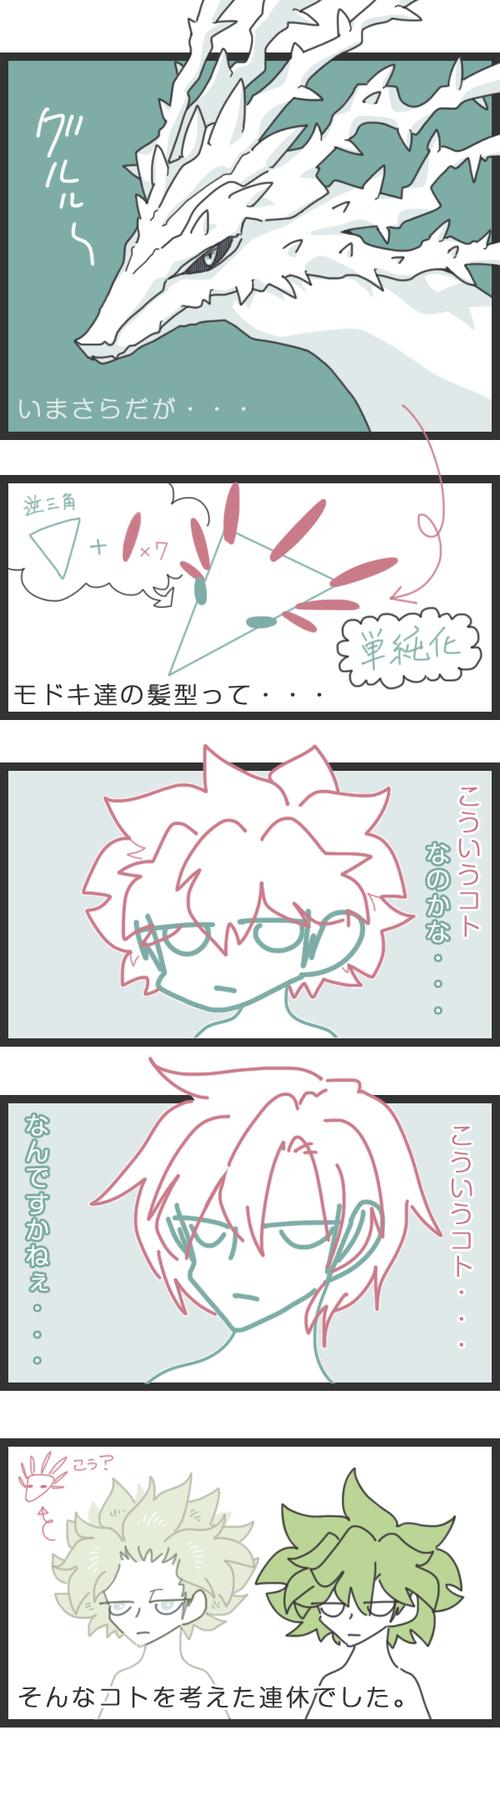 ryuu_kami_210504